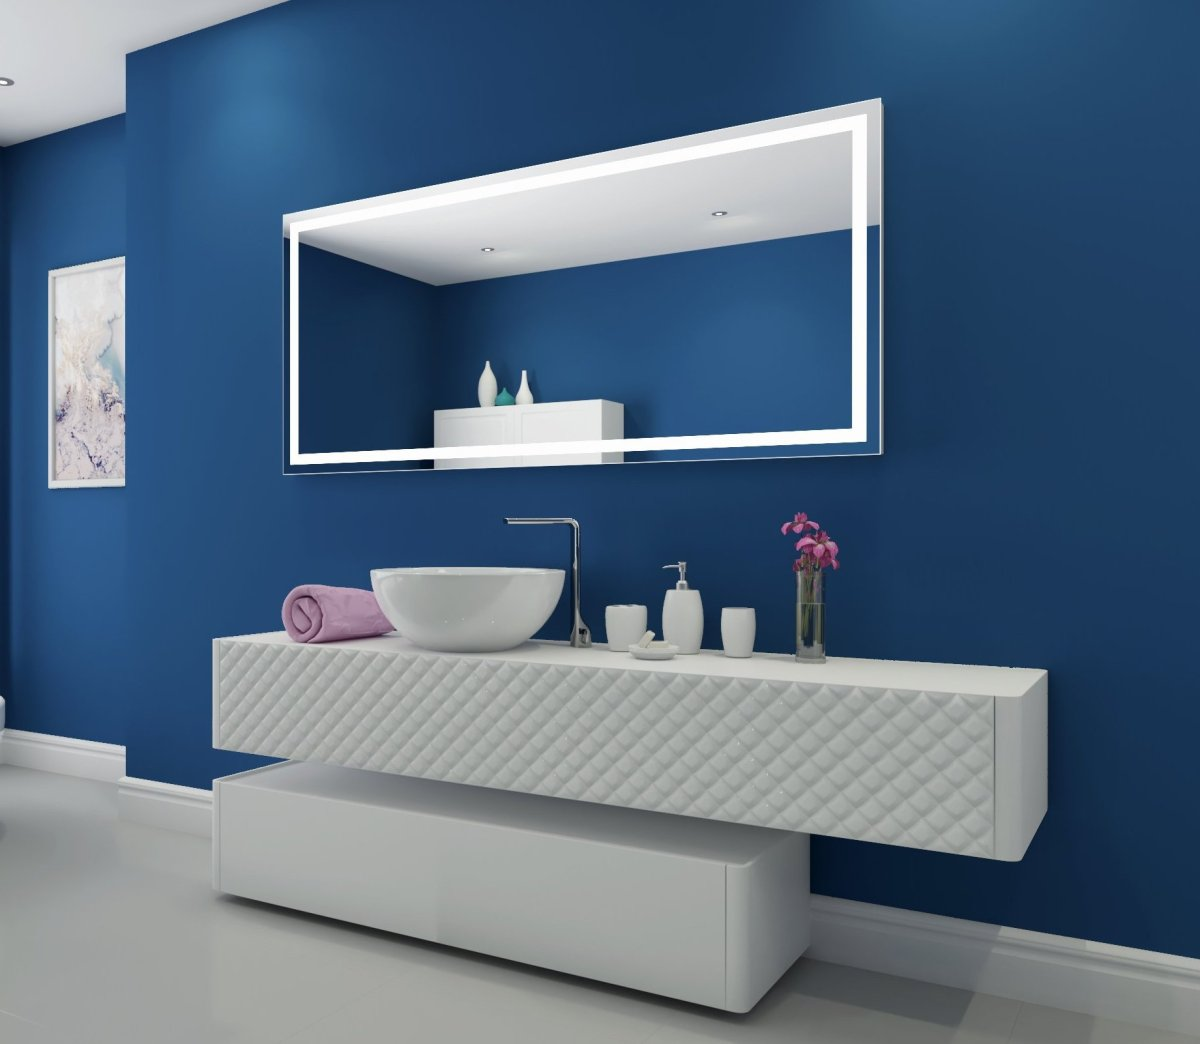 illuminated, bathroom, mirror, double vanity